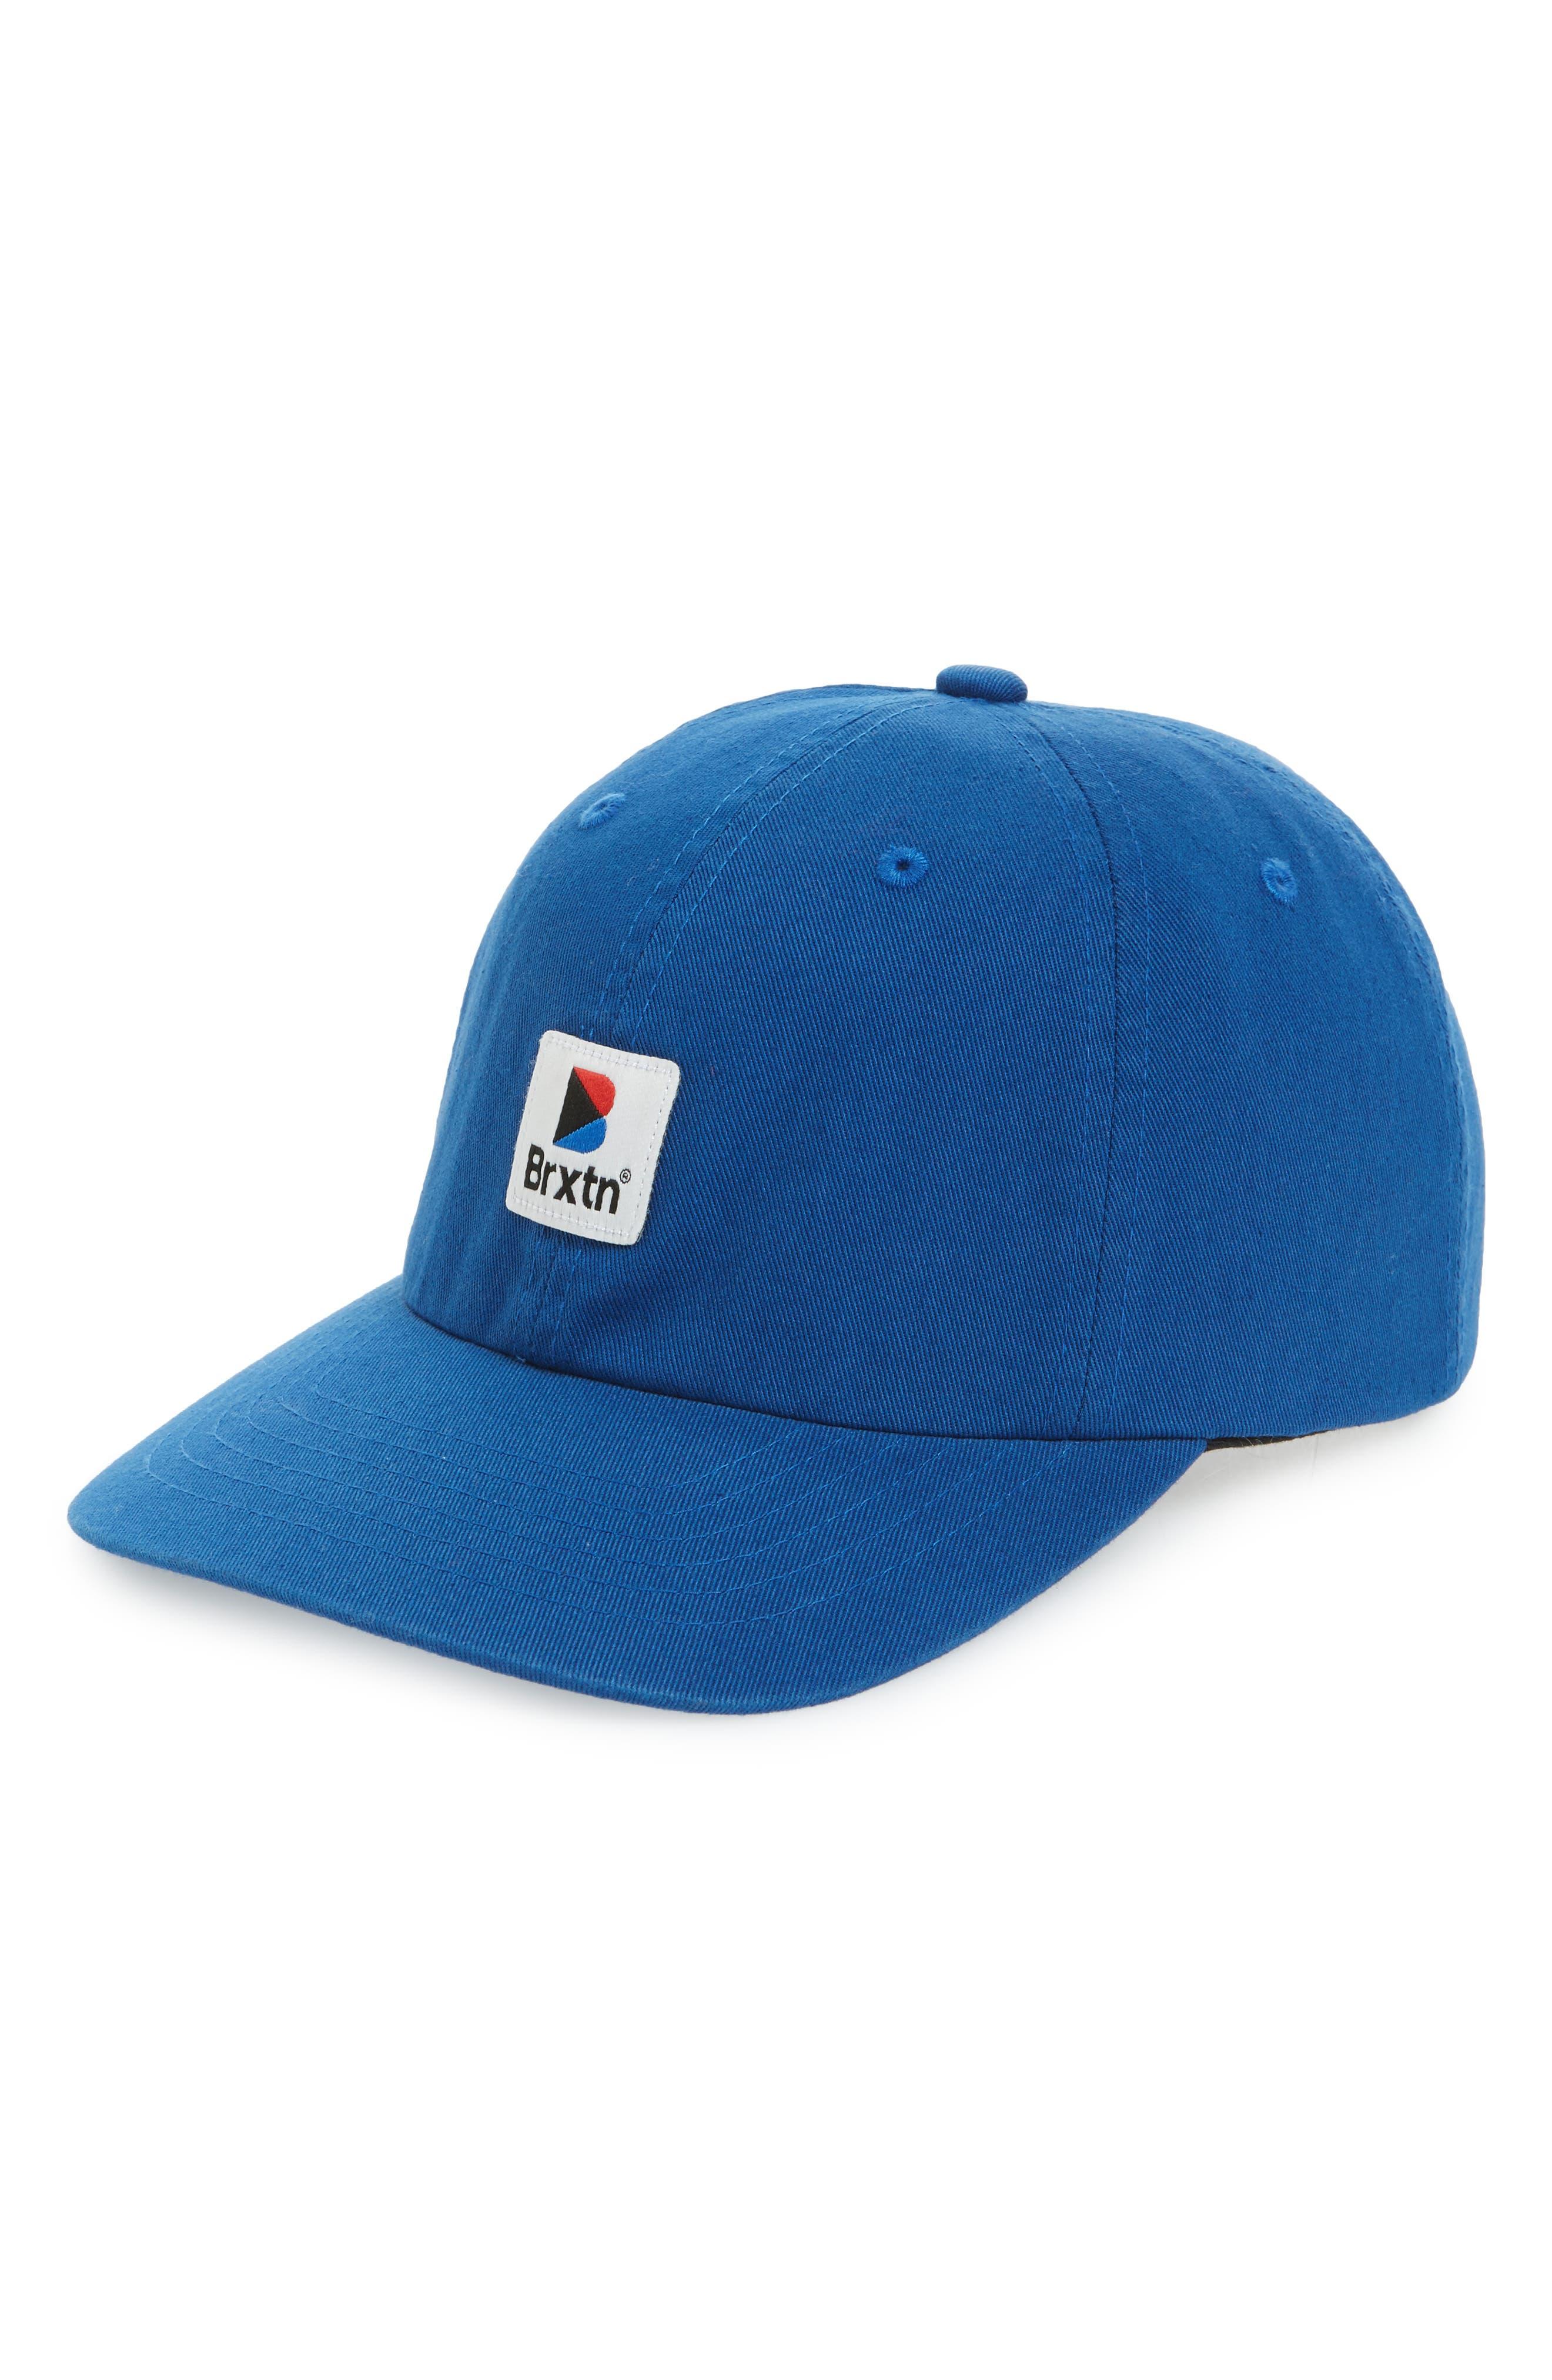 detailed look e8386 c3810 ... low cost brixton stowell baseball cap ad807 90007 uk brixton oath iii  ...